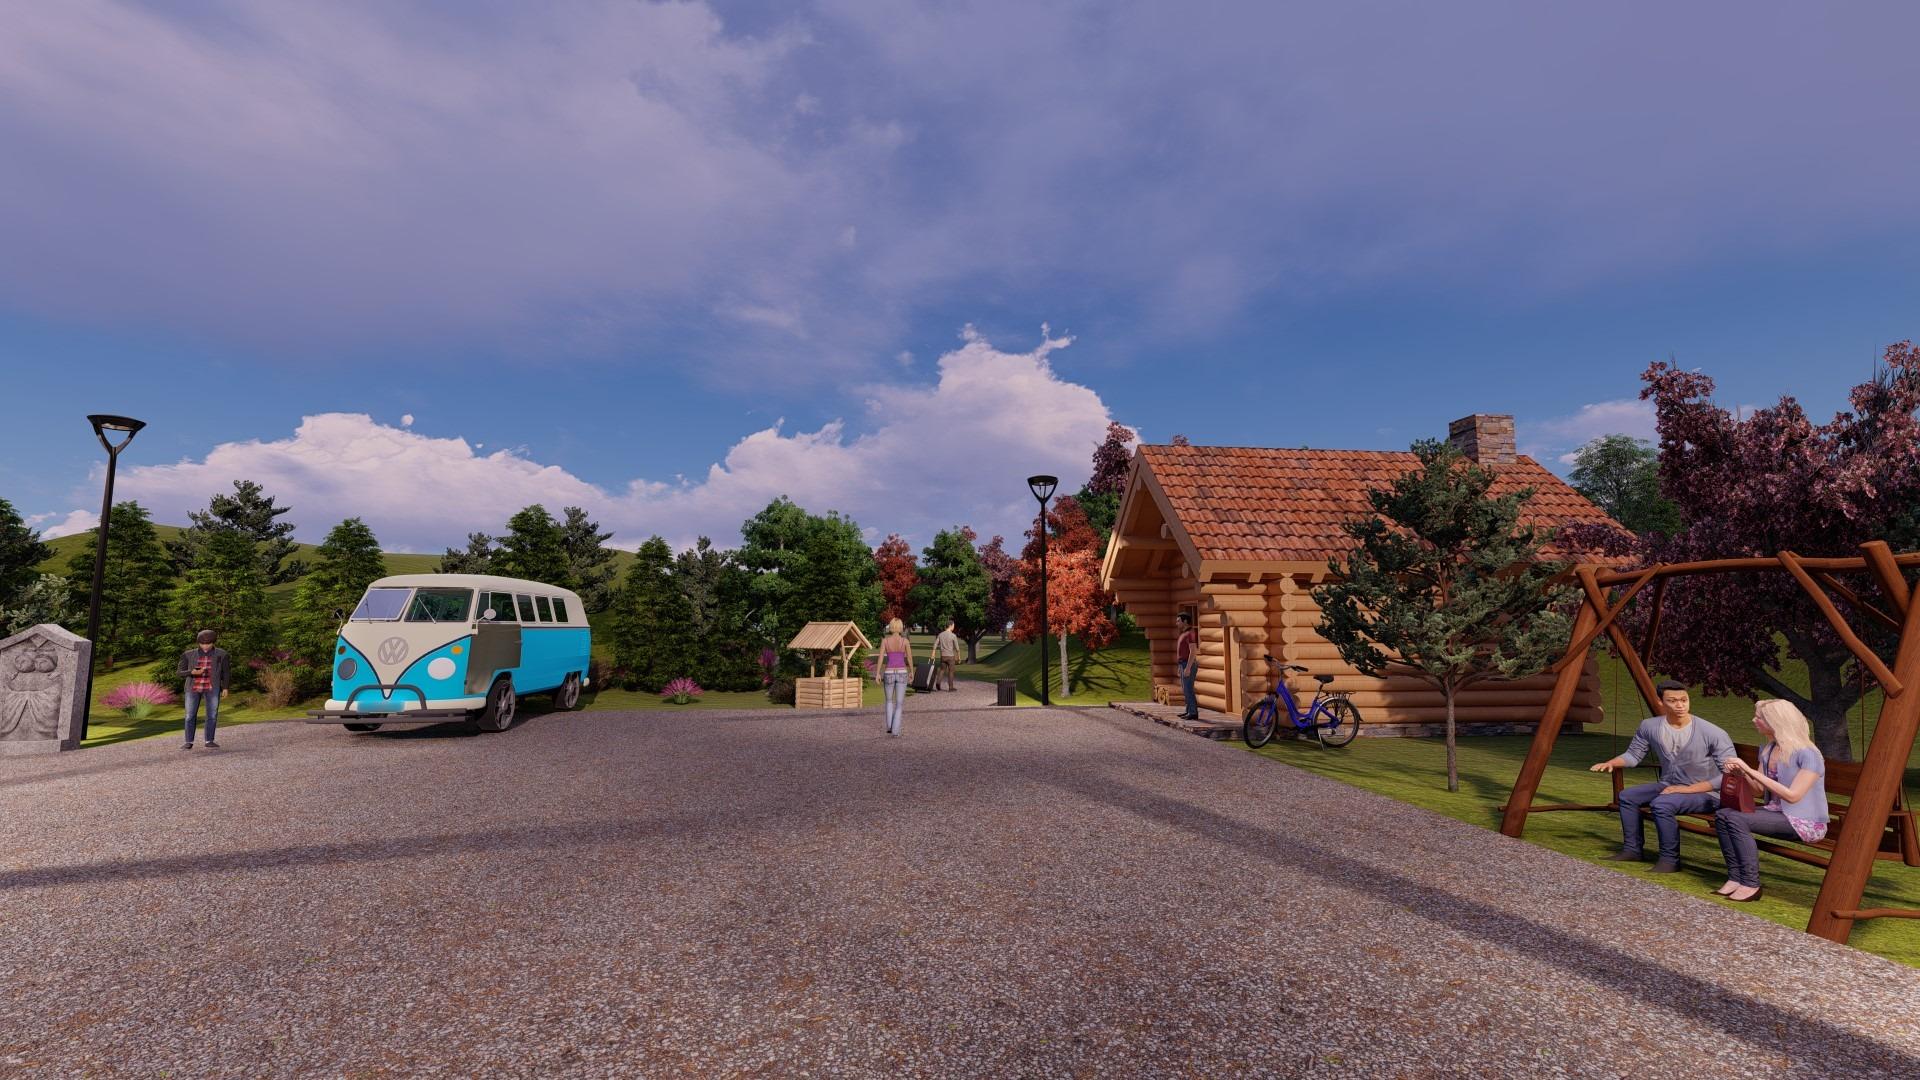 Artfulparks Carpark & Main Reception